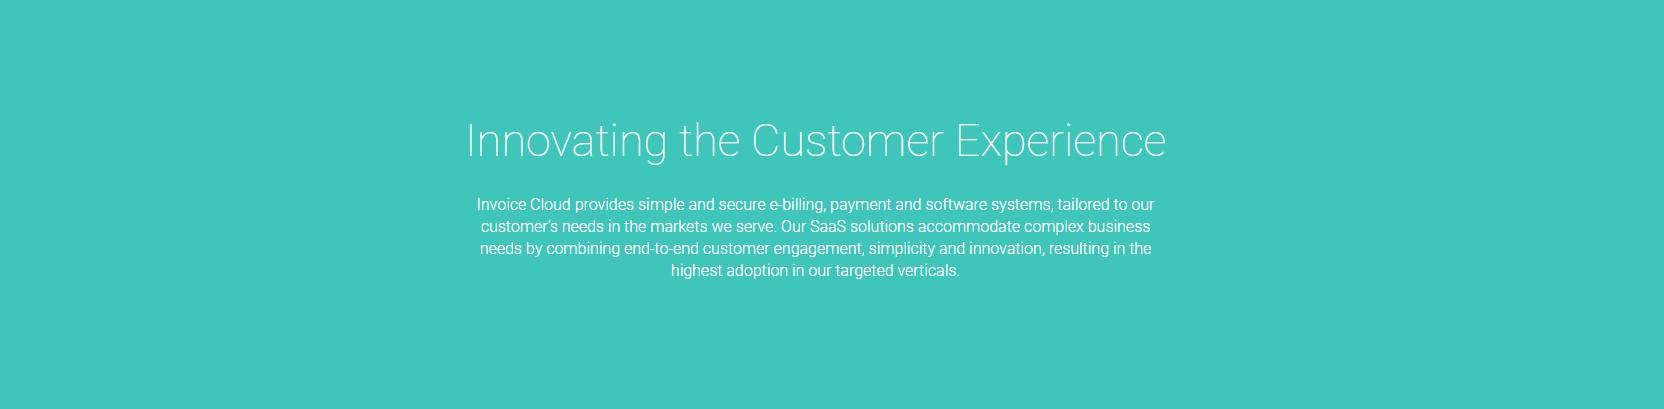 Invoice Cloud, Inc  | LinkedIn